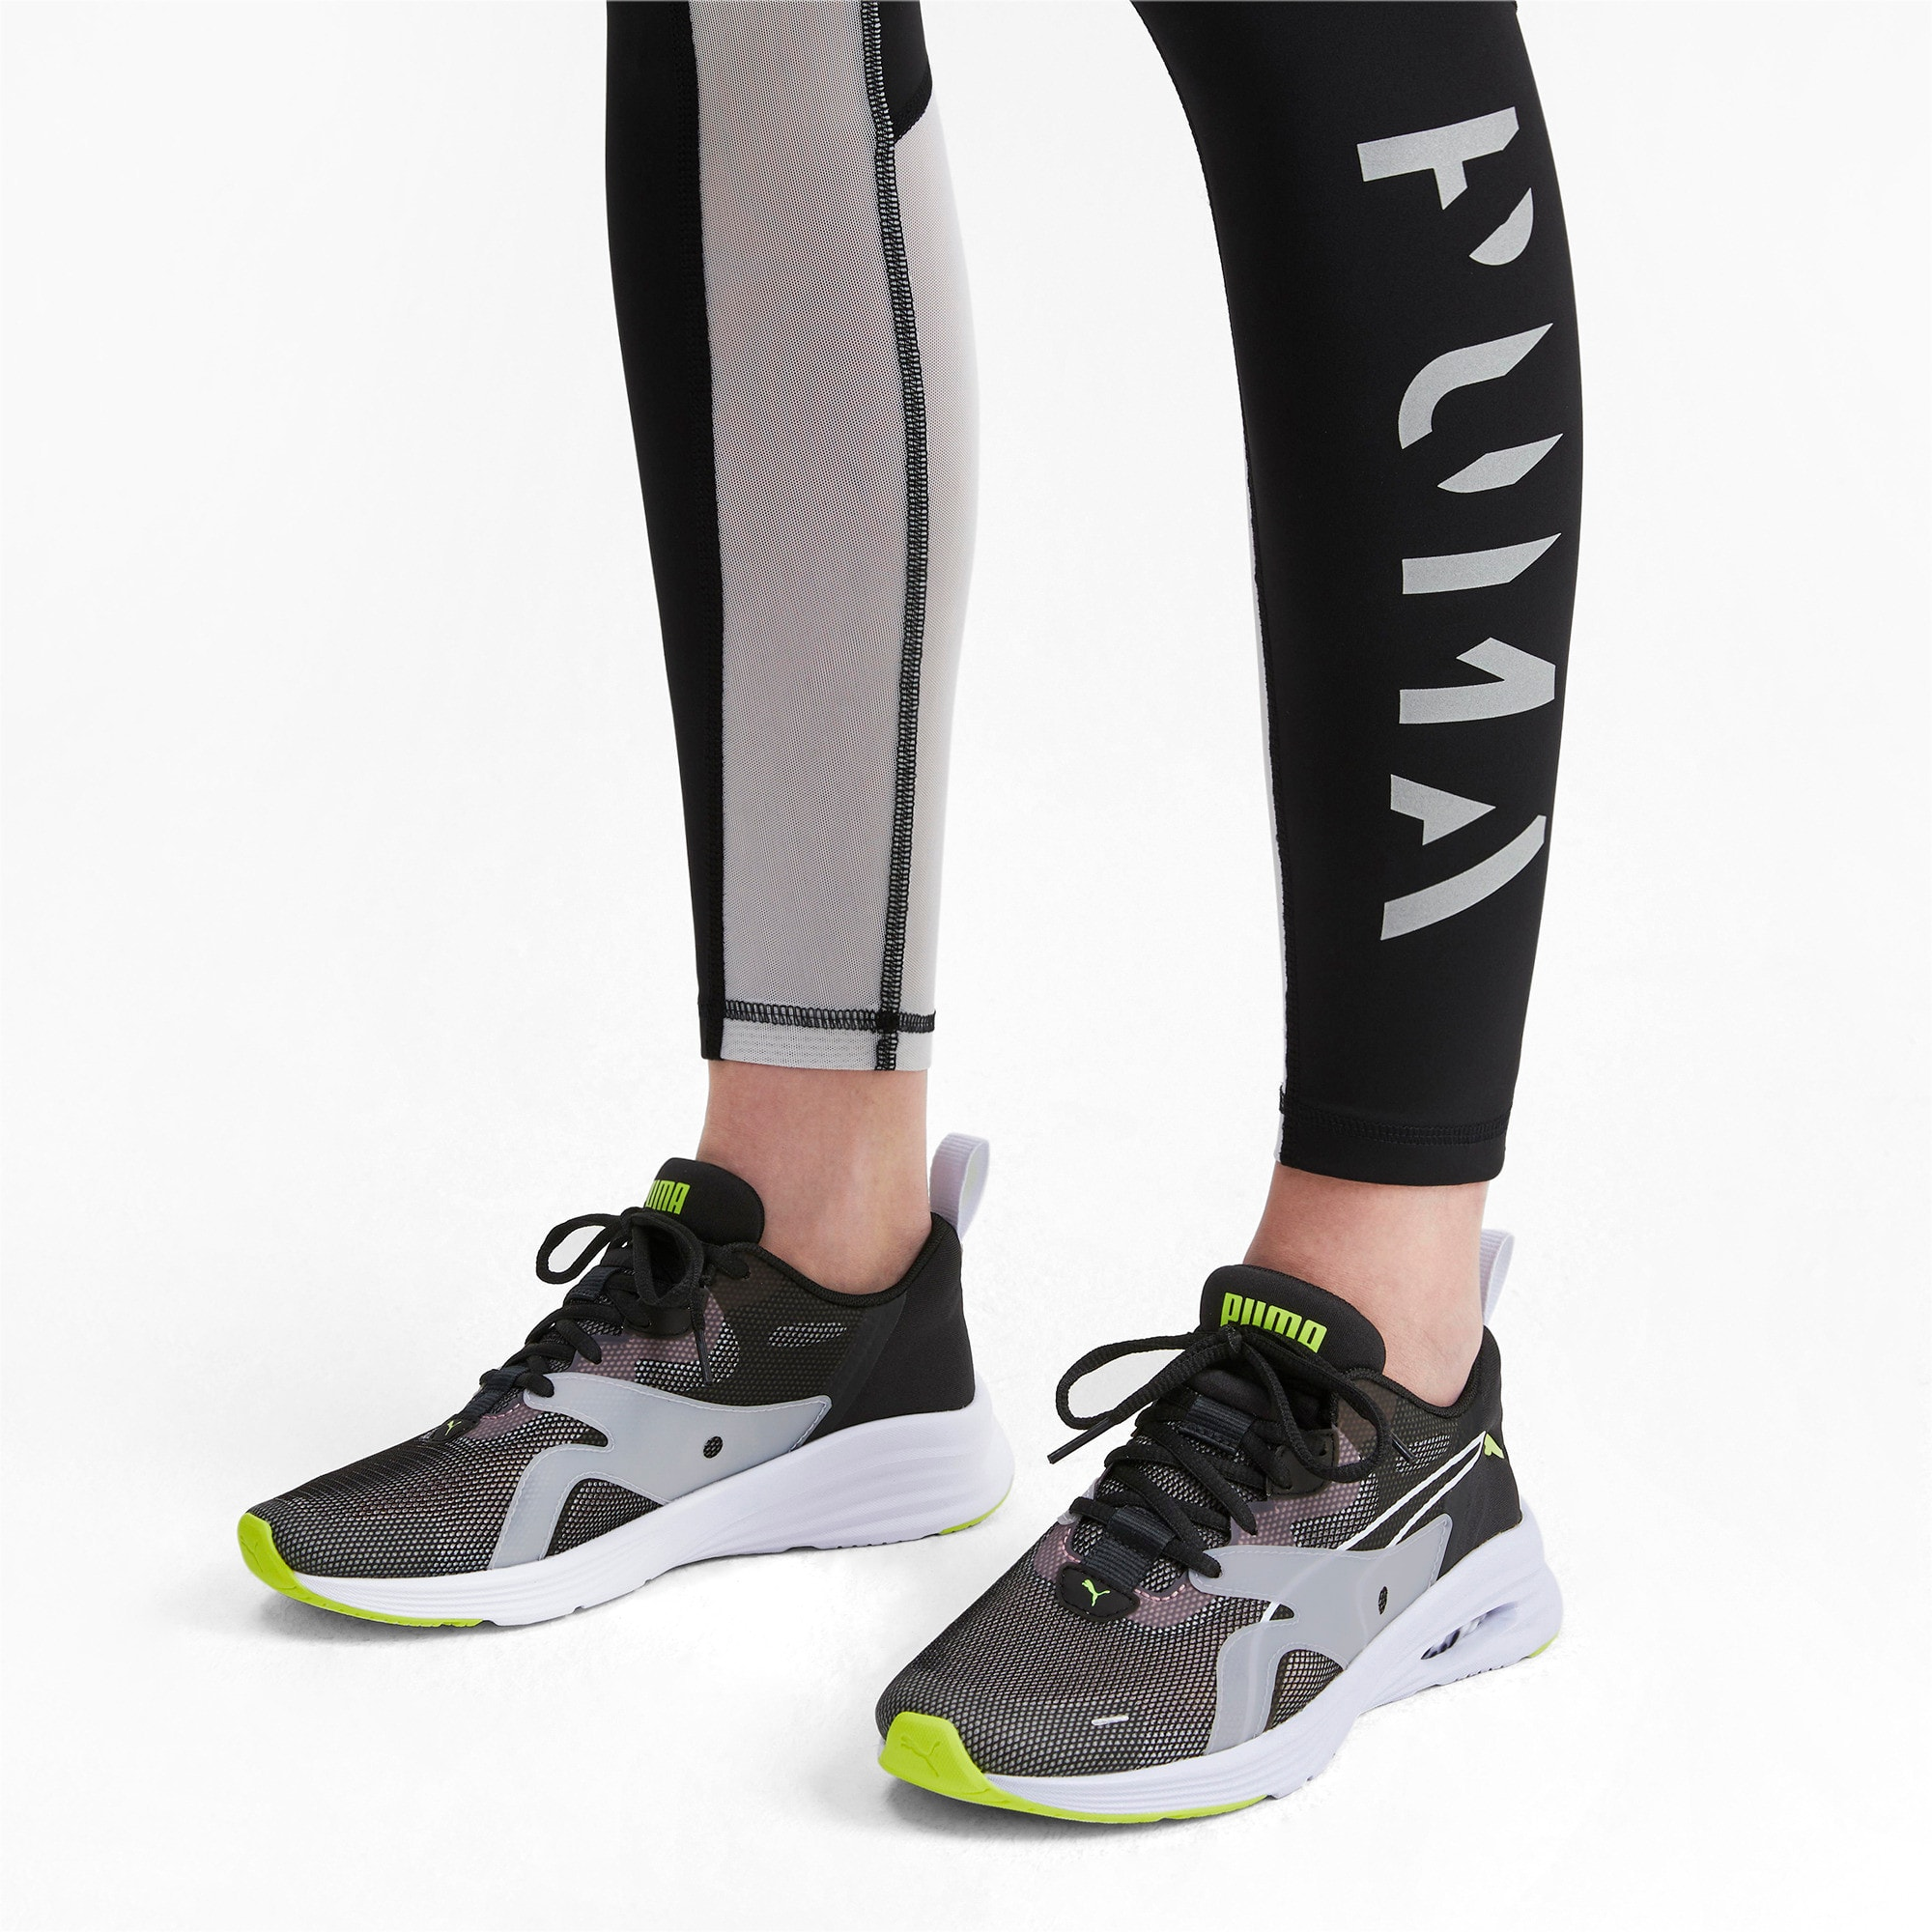 Thumbnail 3 of HYBRID Fuego Shift Women's Running Shoes, Puma Black-Bridal Rose, medium